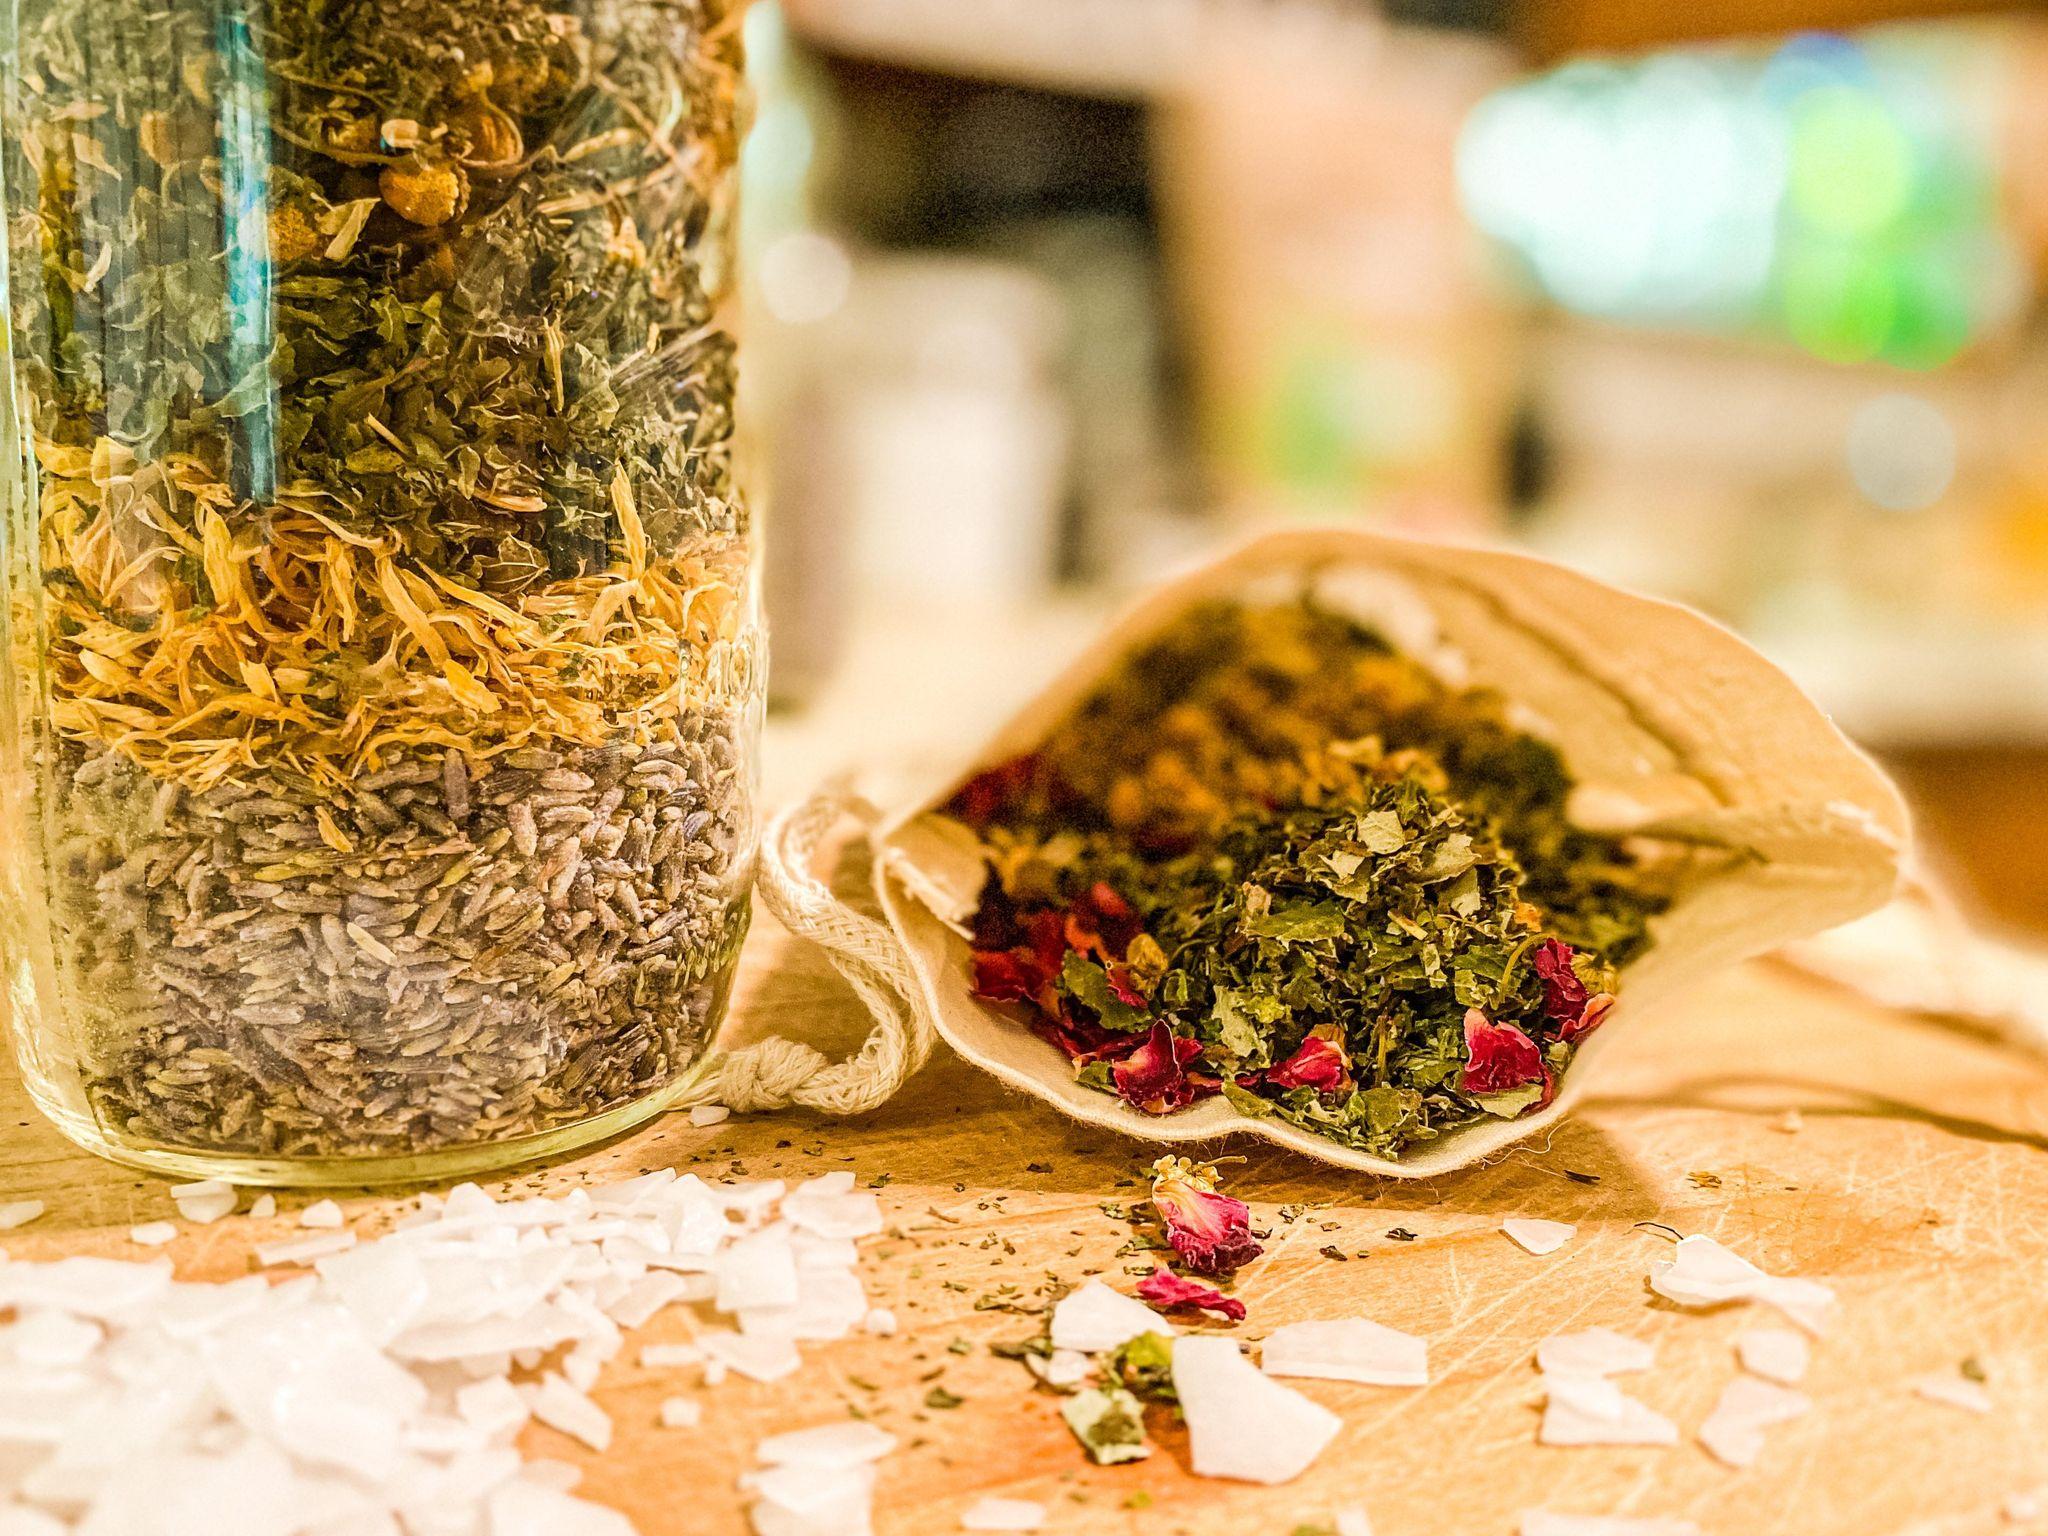 A muslin sack and mason jar full of herbal pregnancy bath blend